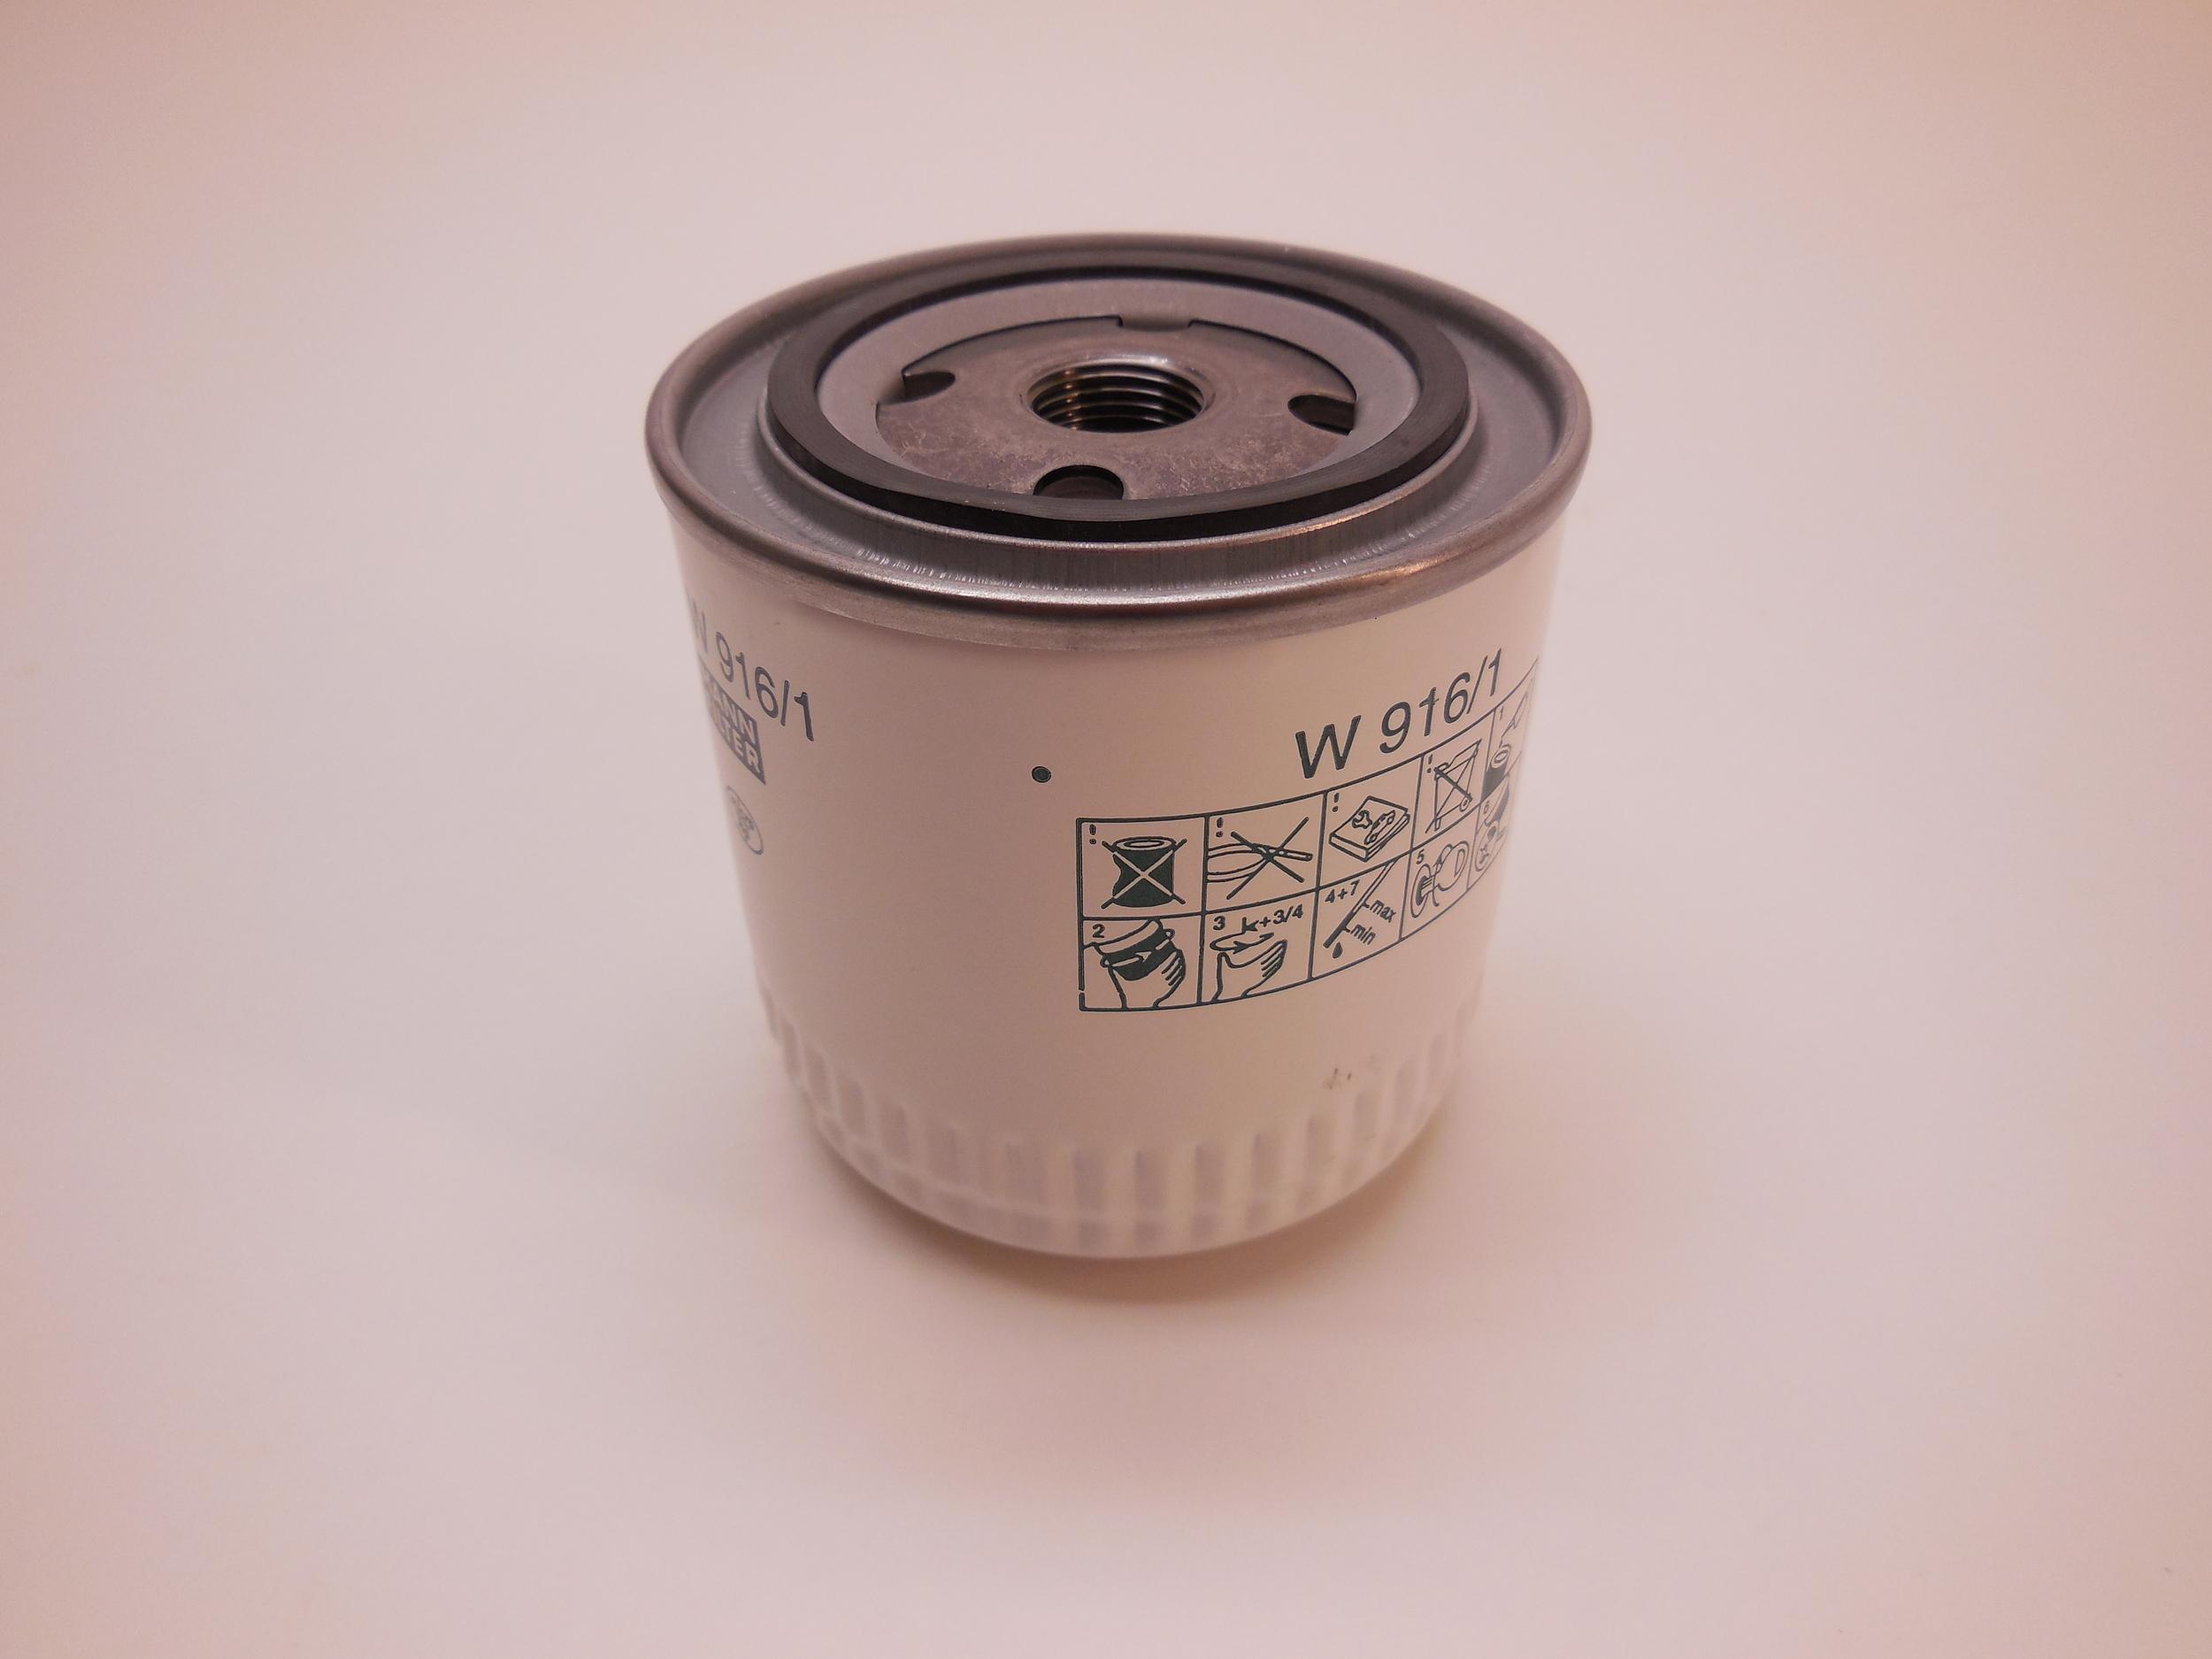 Oil Filter Häggo Nr: 453 7091-051   Price: 59 SEK